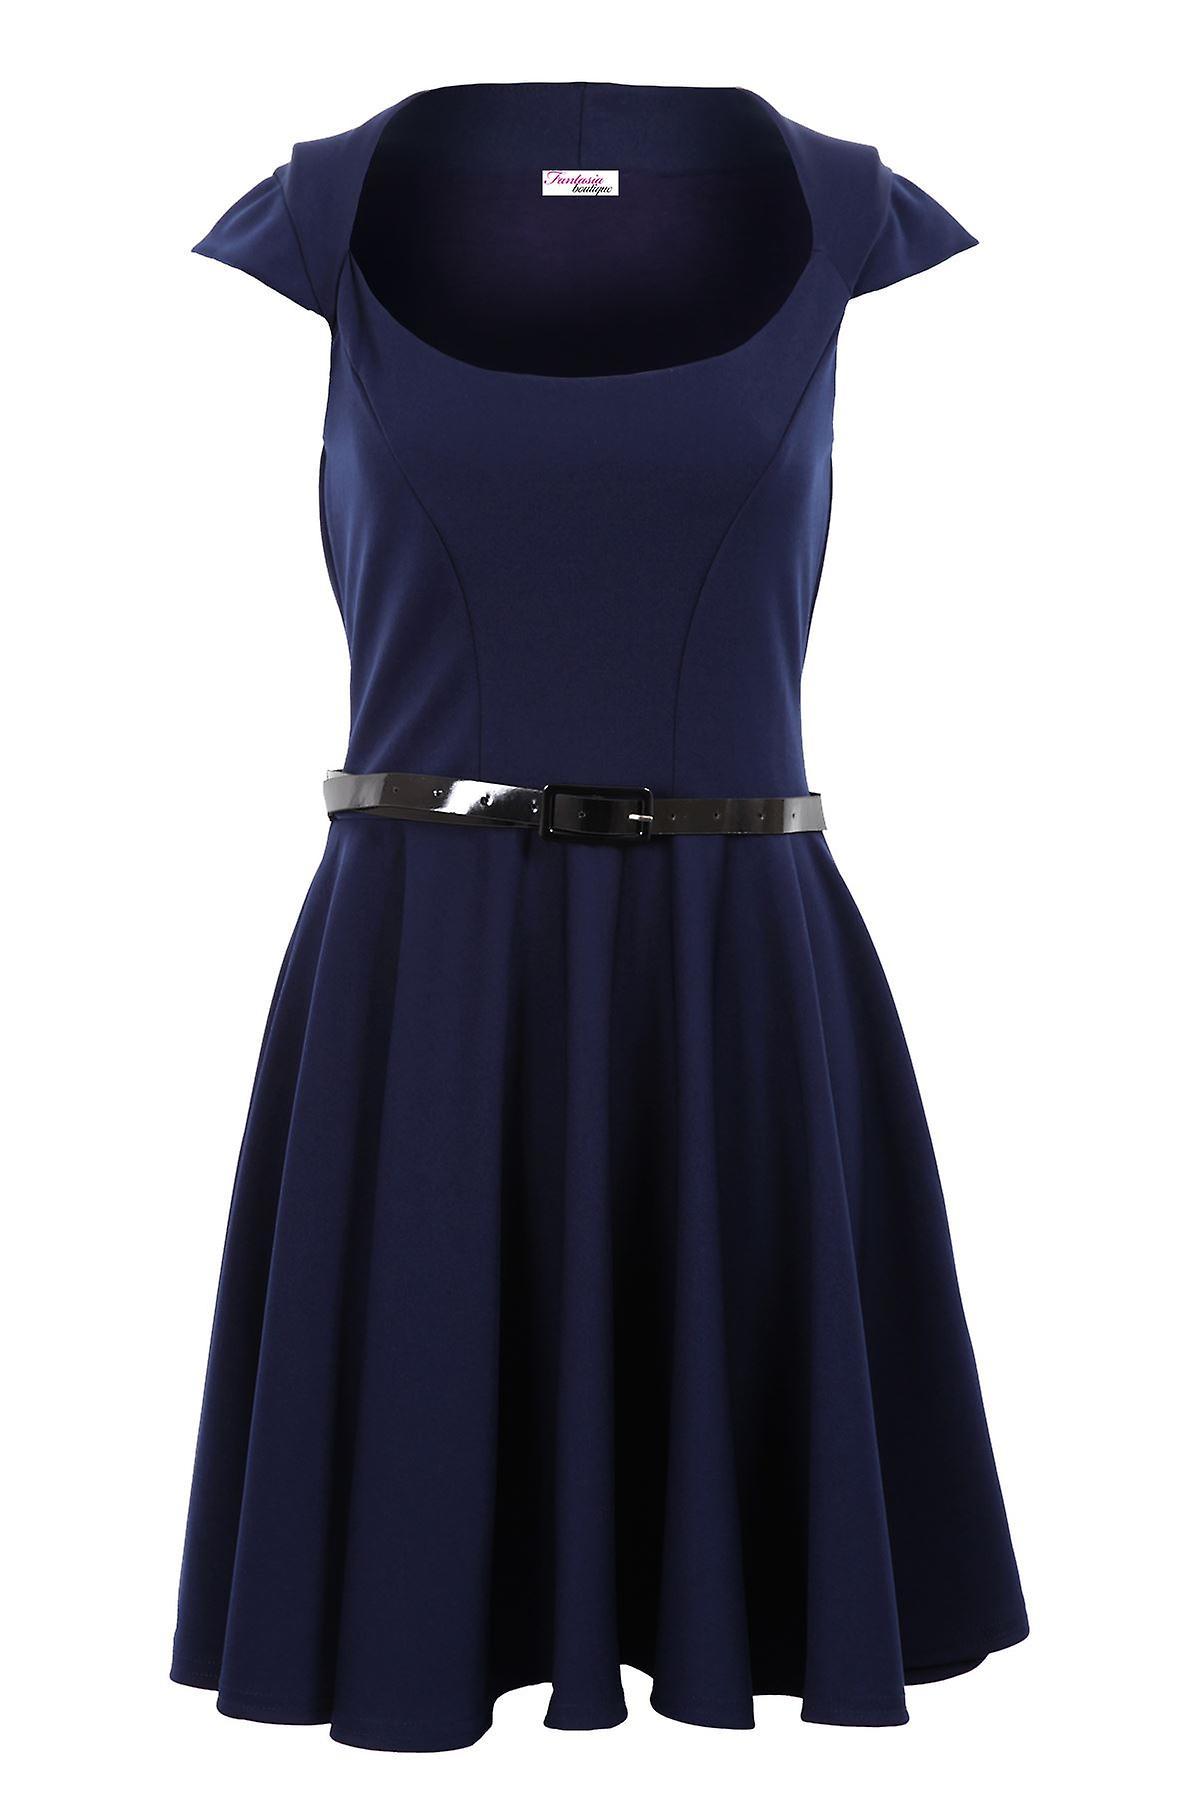 Ladies Cap Sleeve Belted Skater Flare Wine Red Nude Black Navy Blue Womens Dress